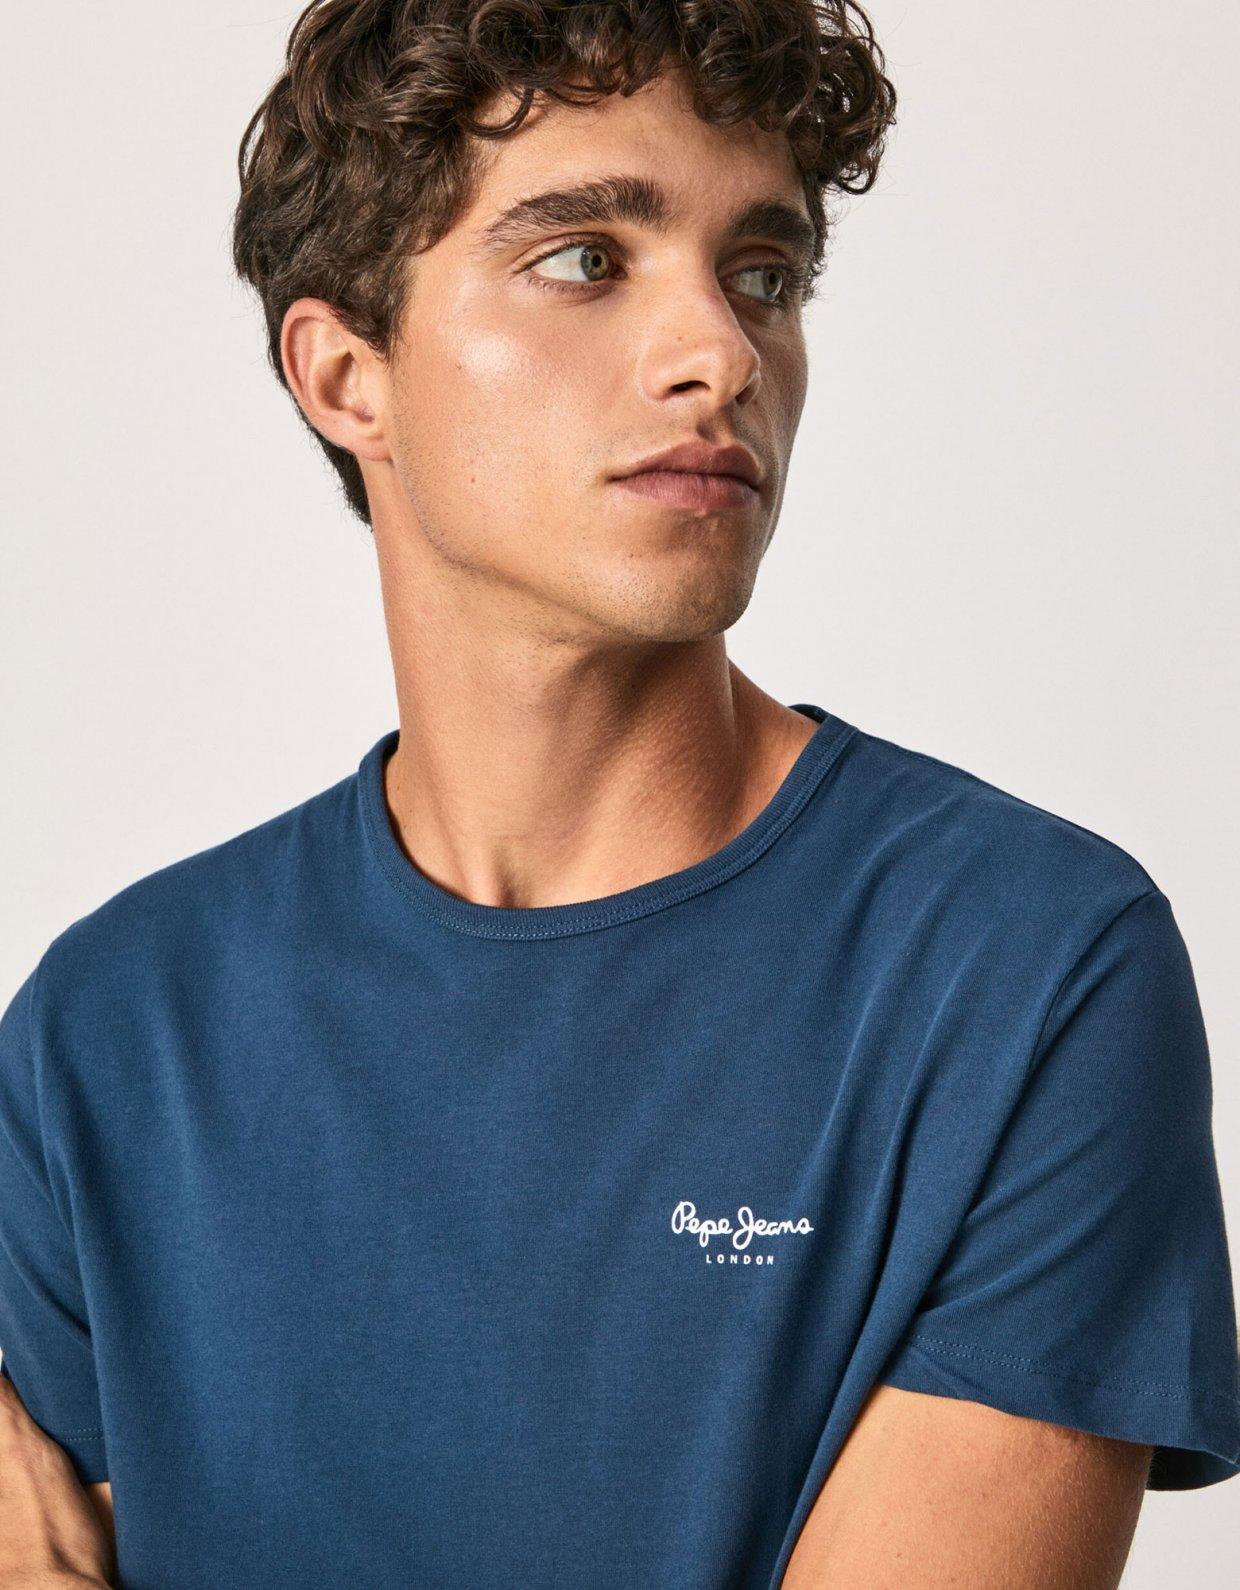 Pepe Jeans Original basic S/S t-shirt navy